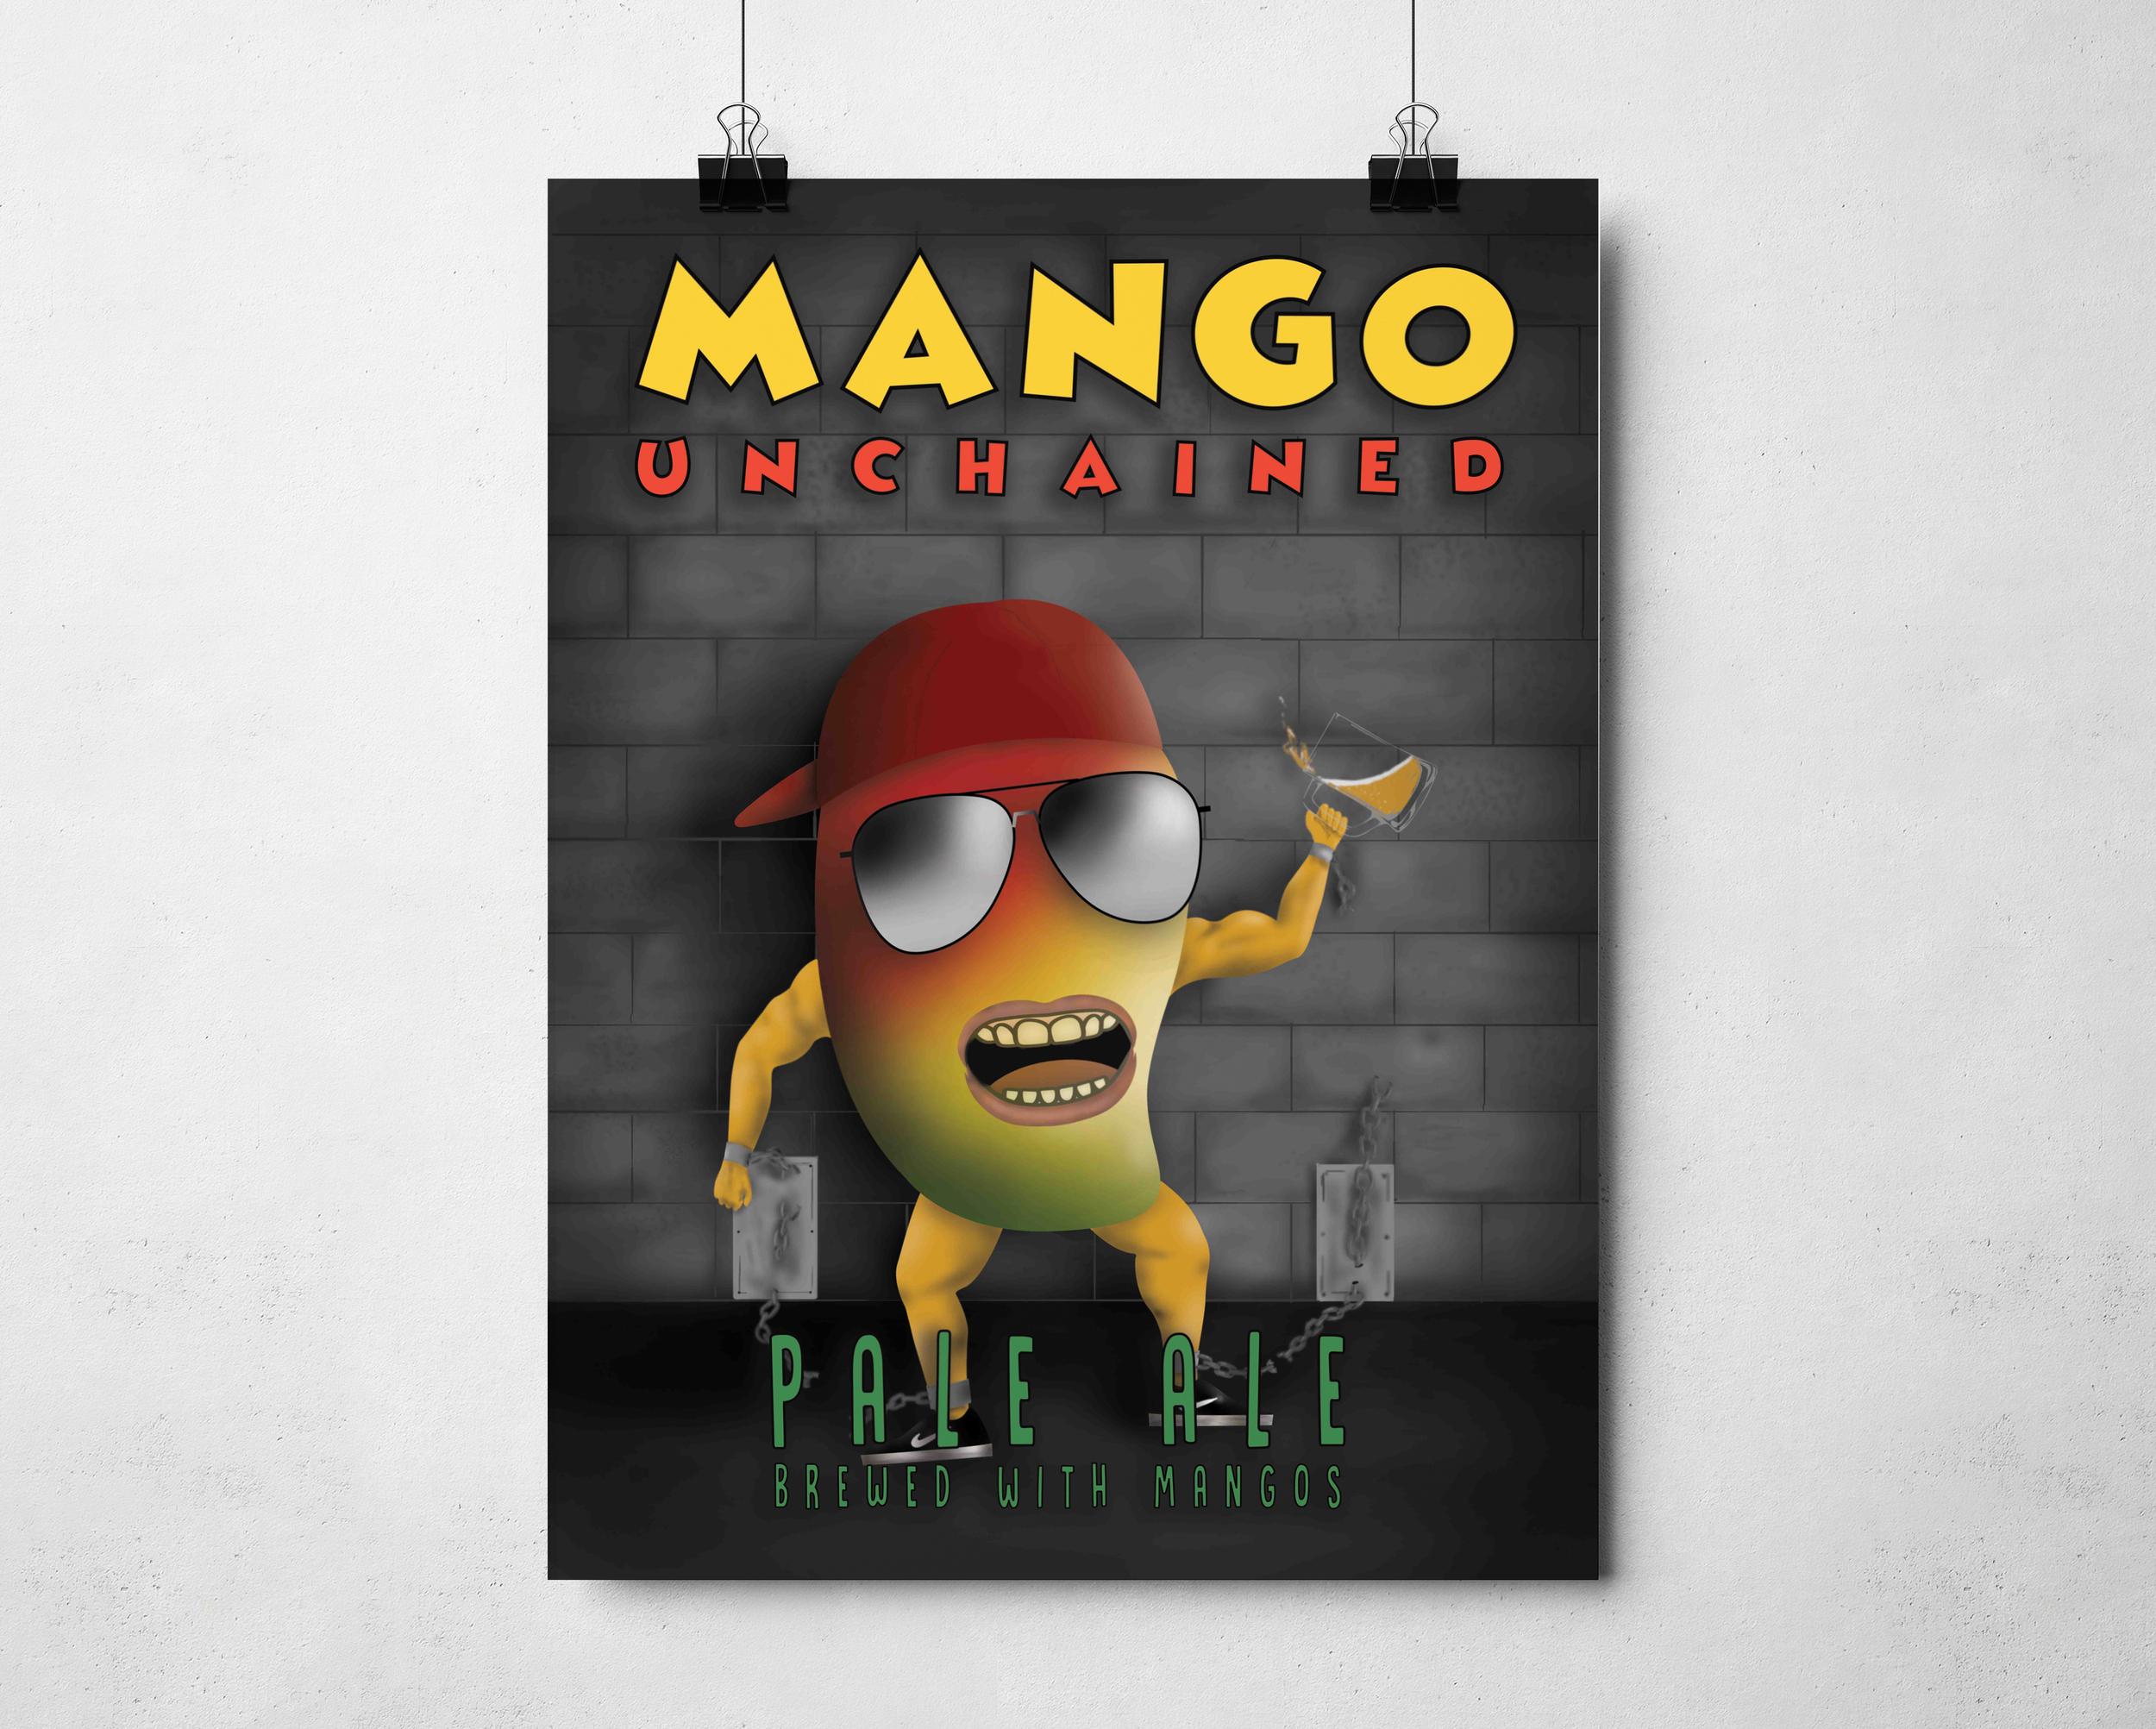 Beer_Posters-Mango.png